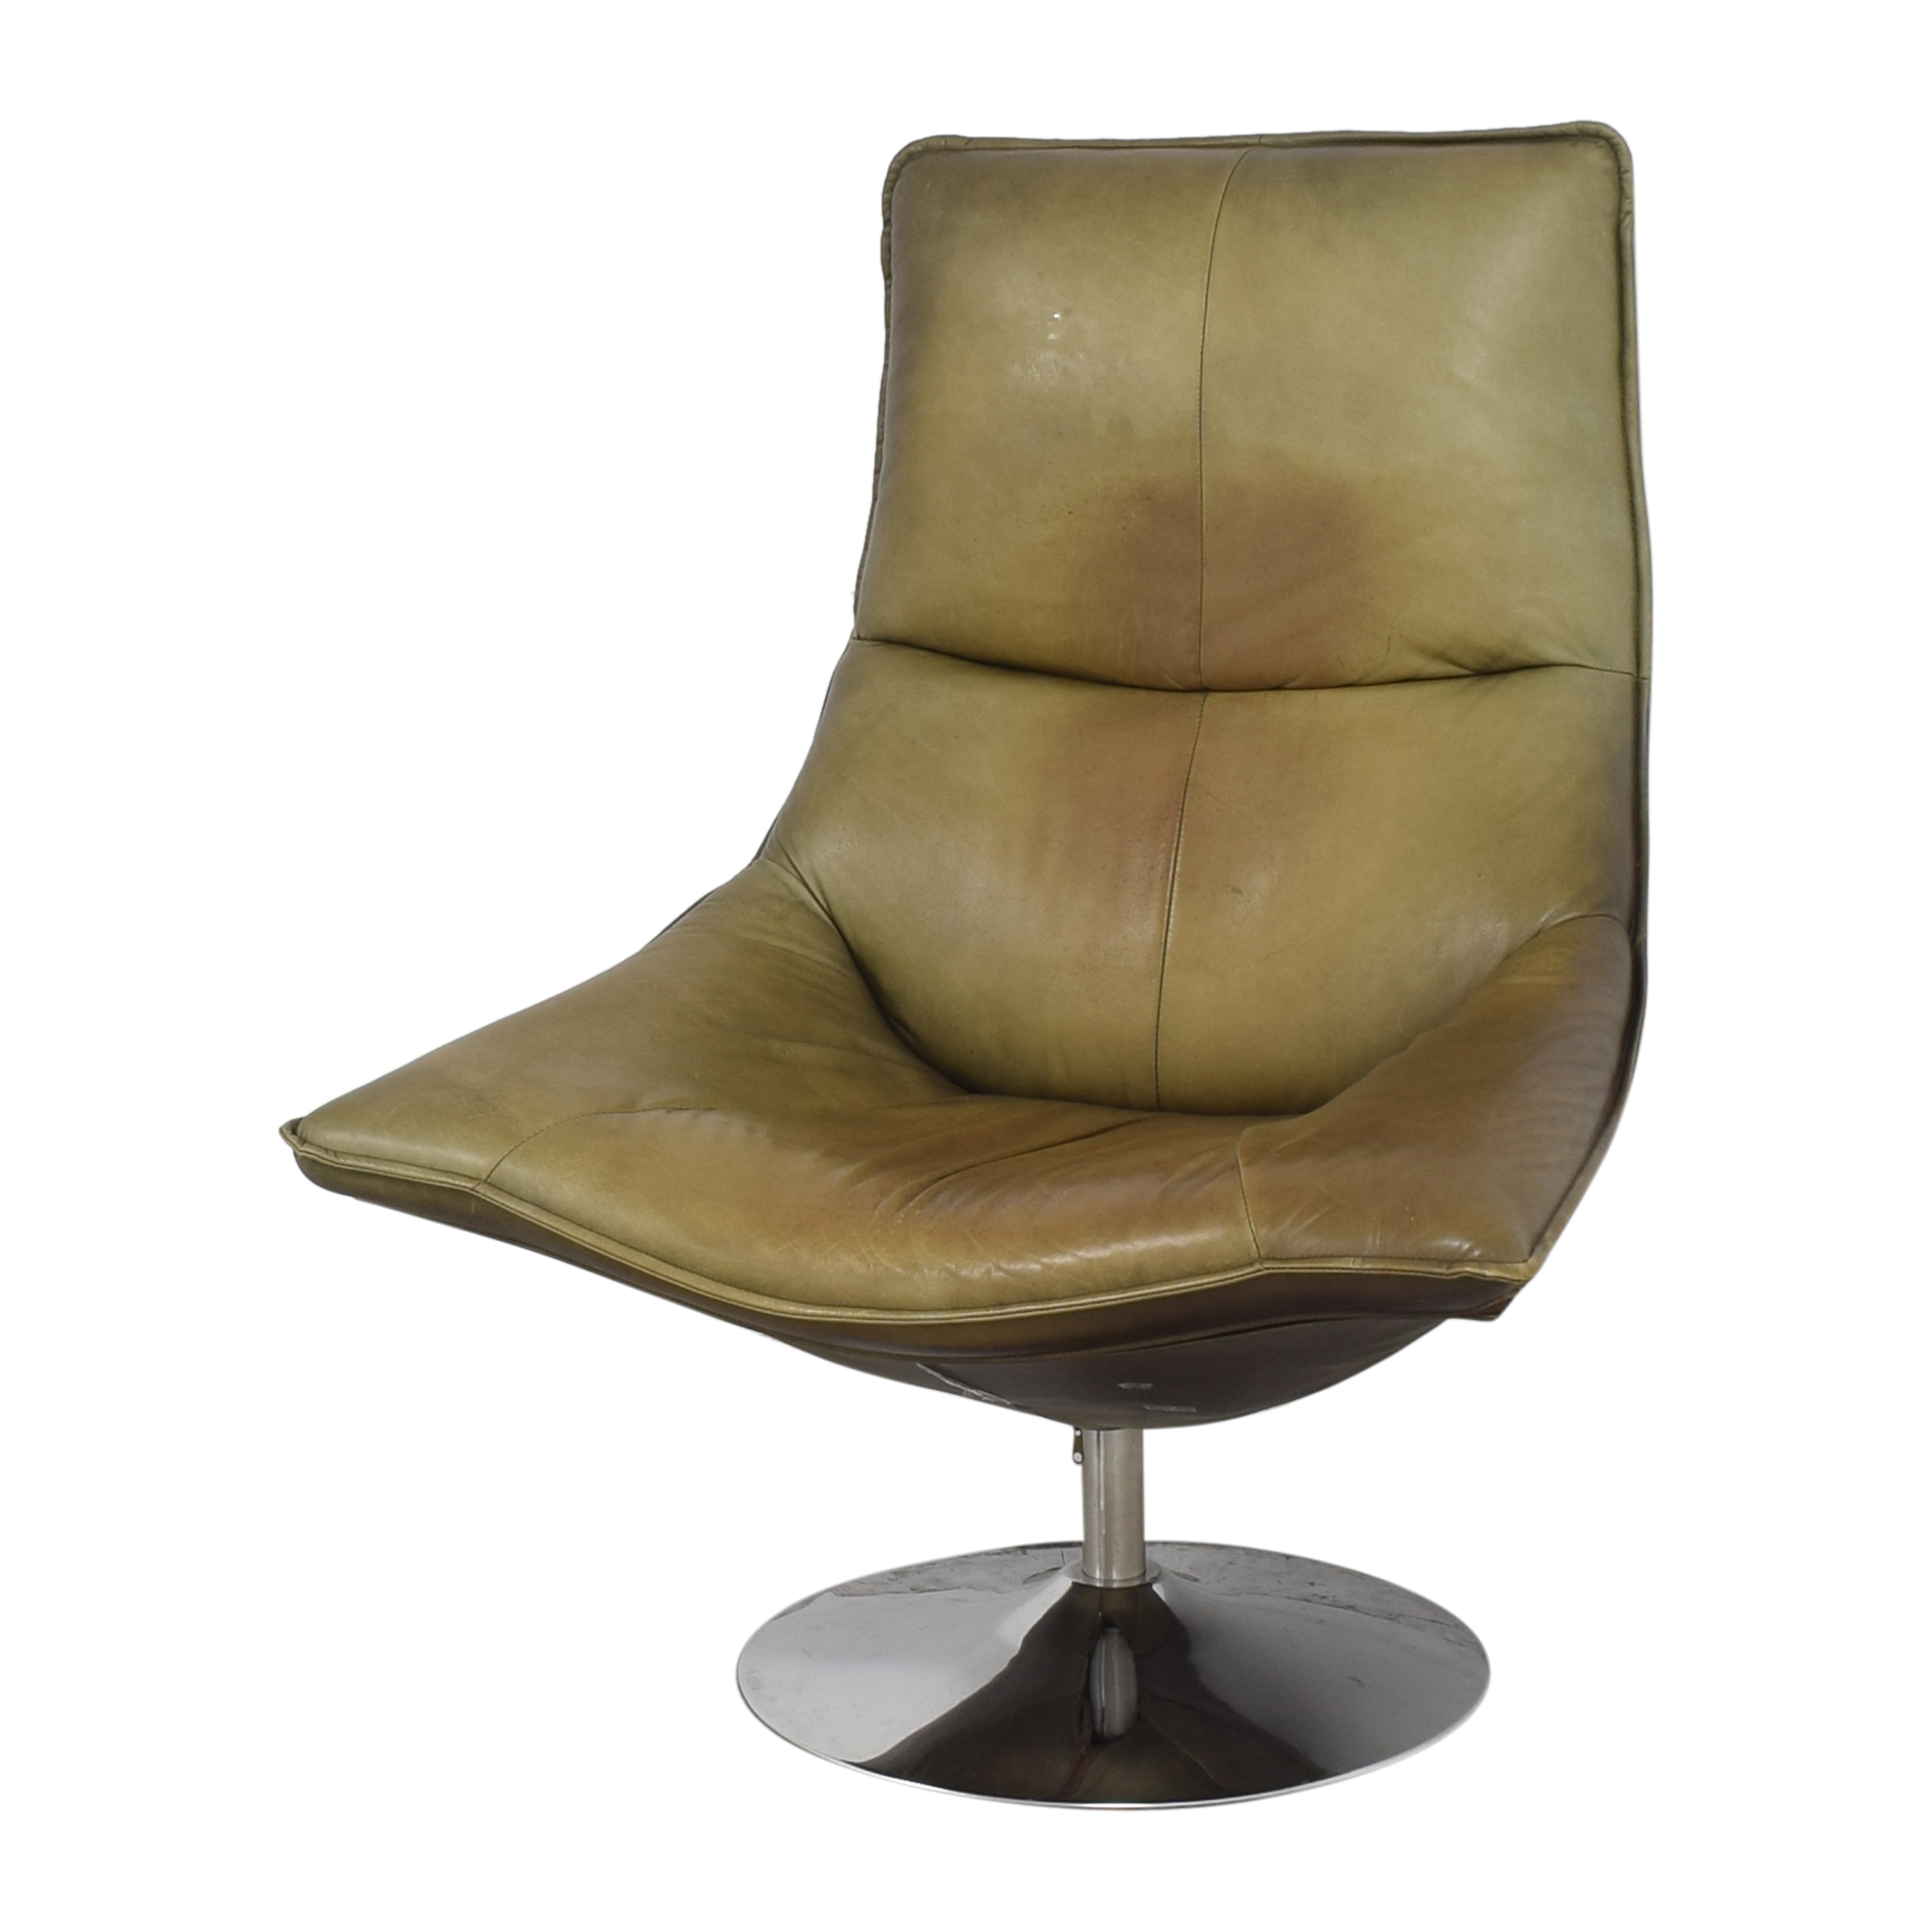 Restoration Hardware Restoration Hardware Hopper Swivel Bucket Chair discount